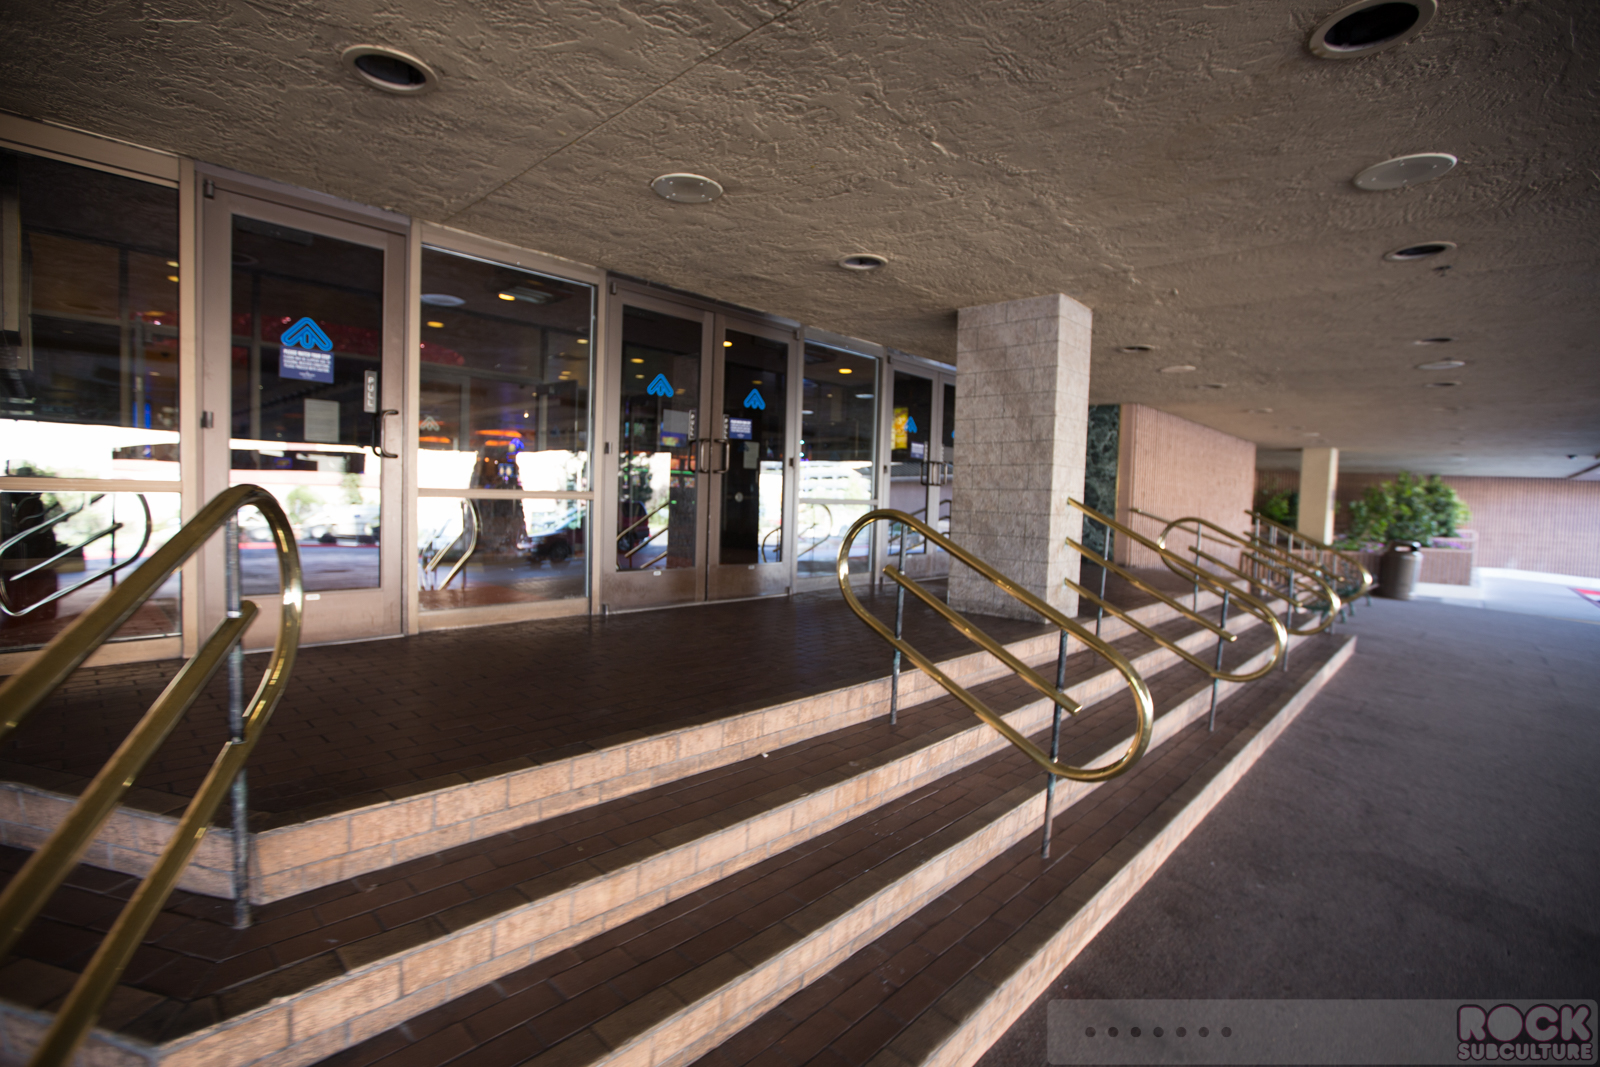 Best Casino Restaurants In South Lake Tahoe